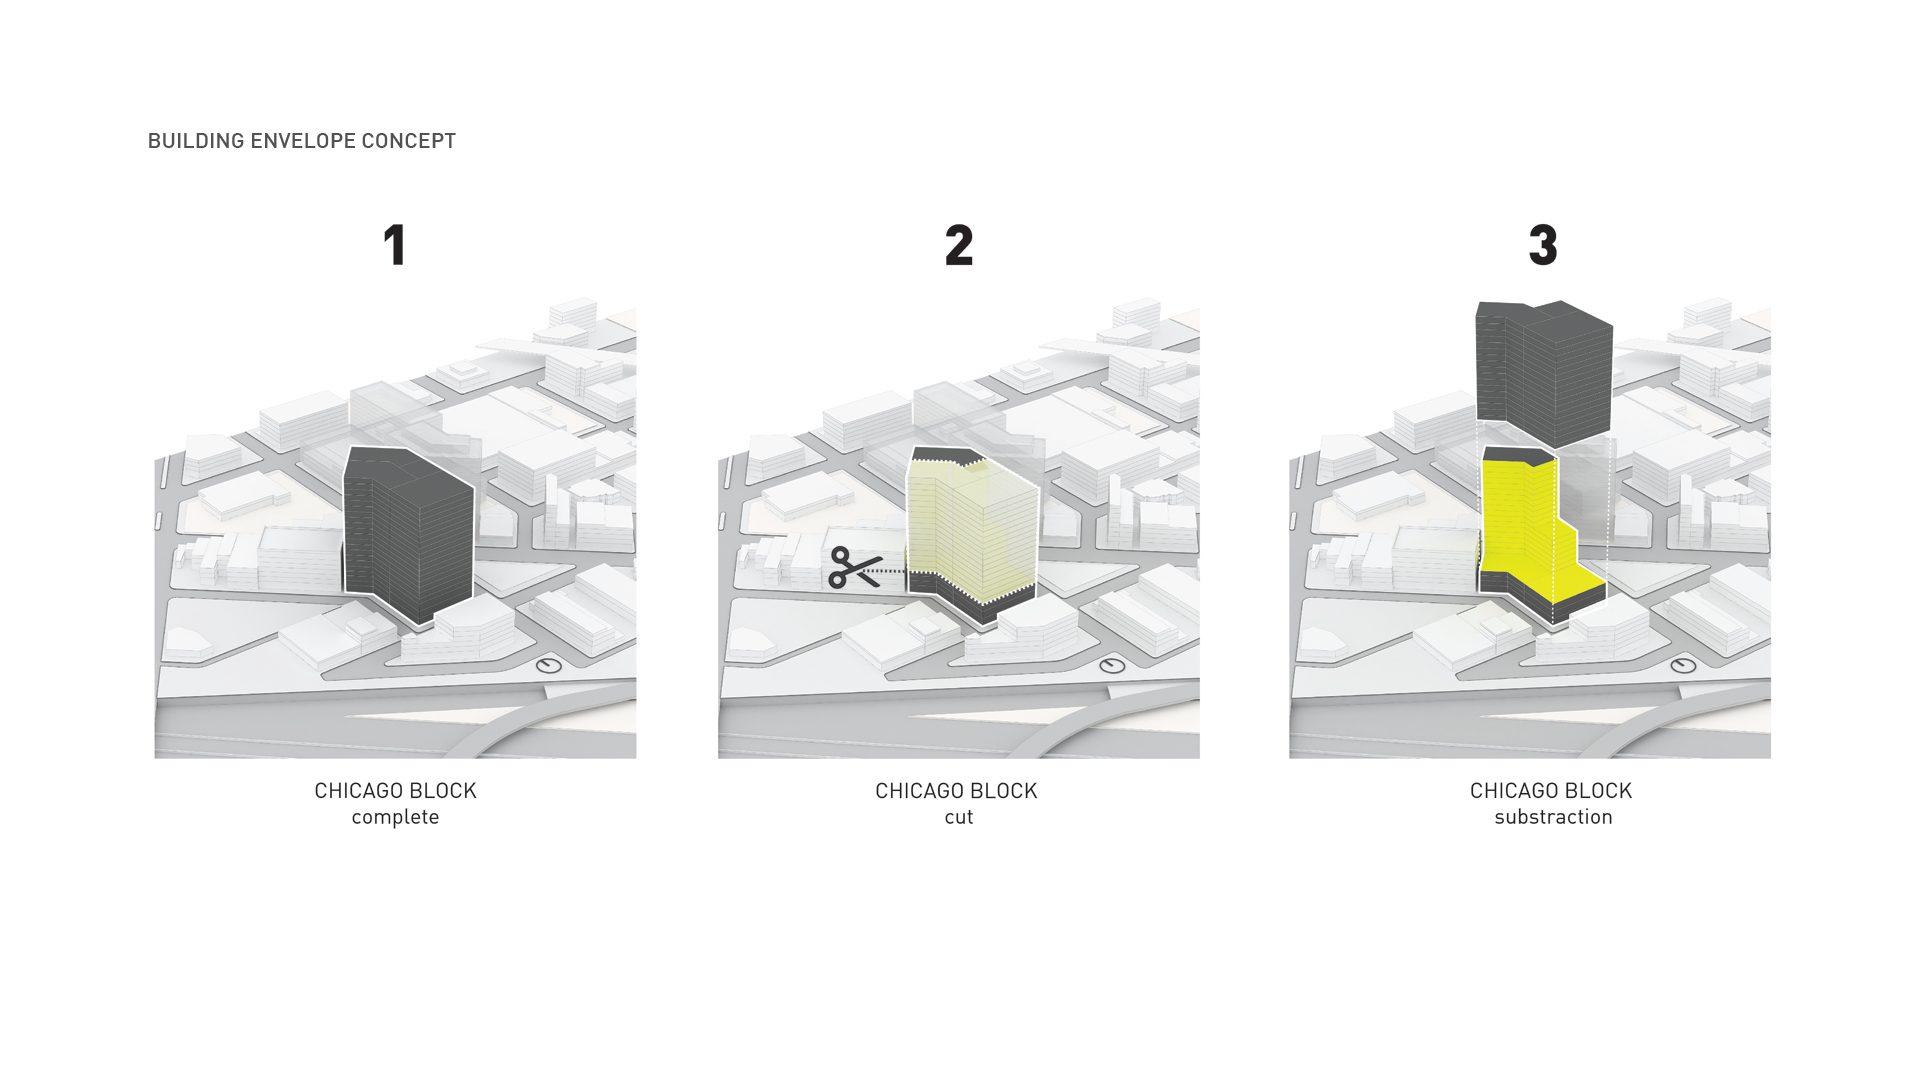 02_Envelope concept